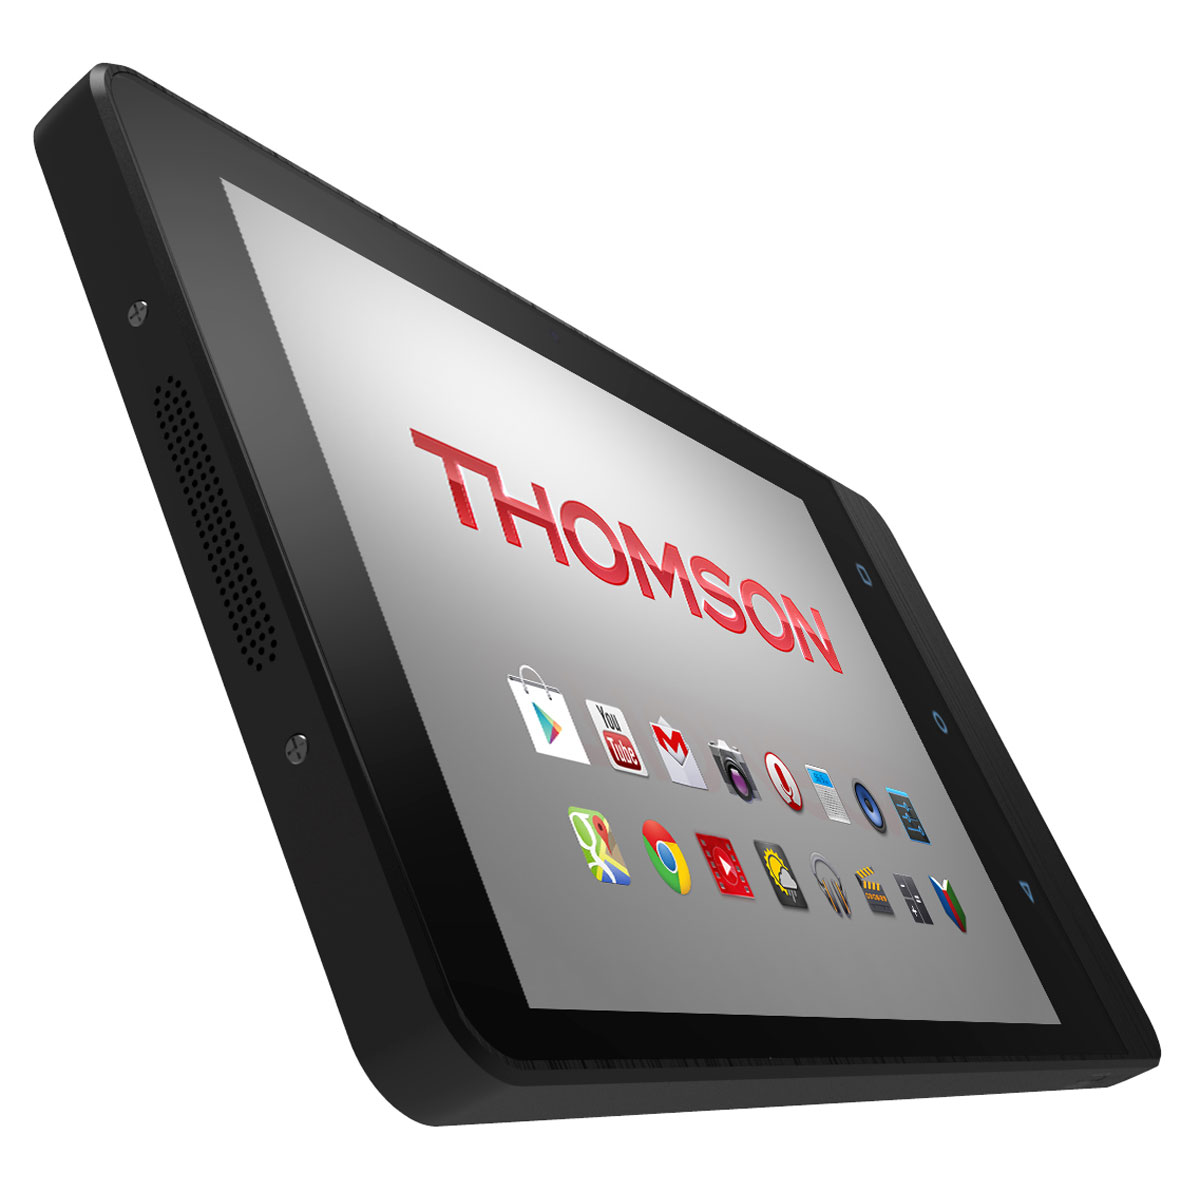 thomson thvid tablette tactile thomson sur. Black Bedroom Furniture Sets. Home Design Ideas